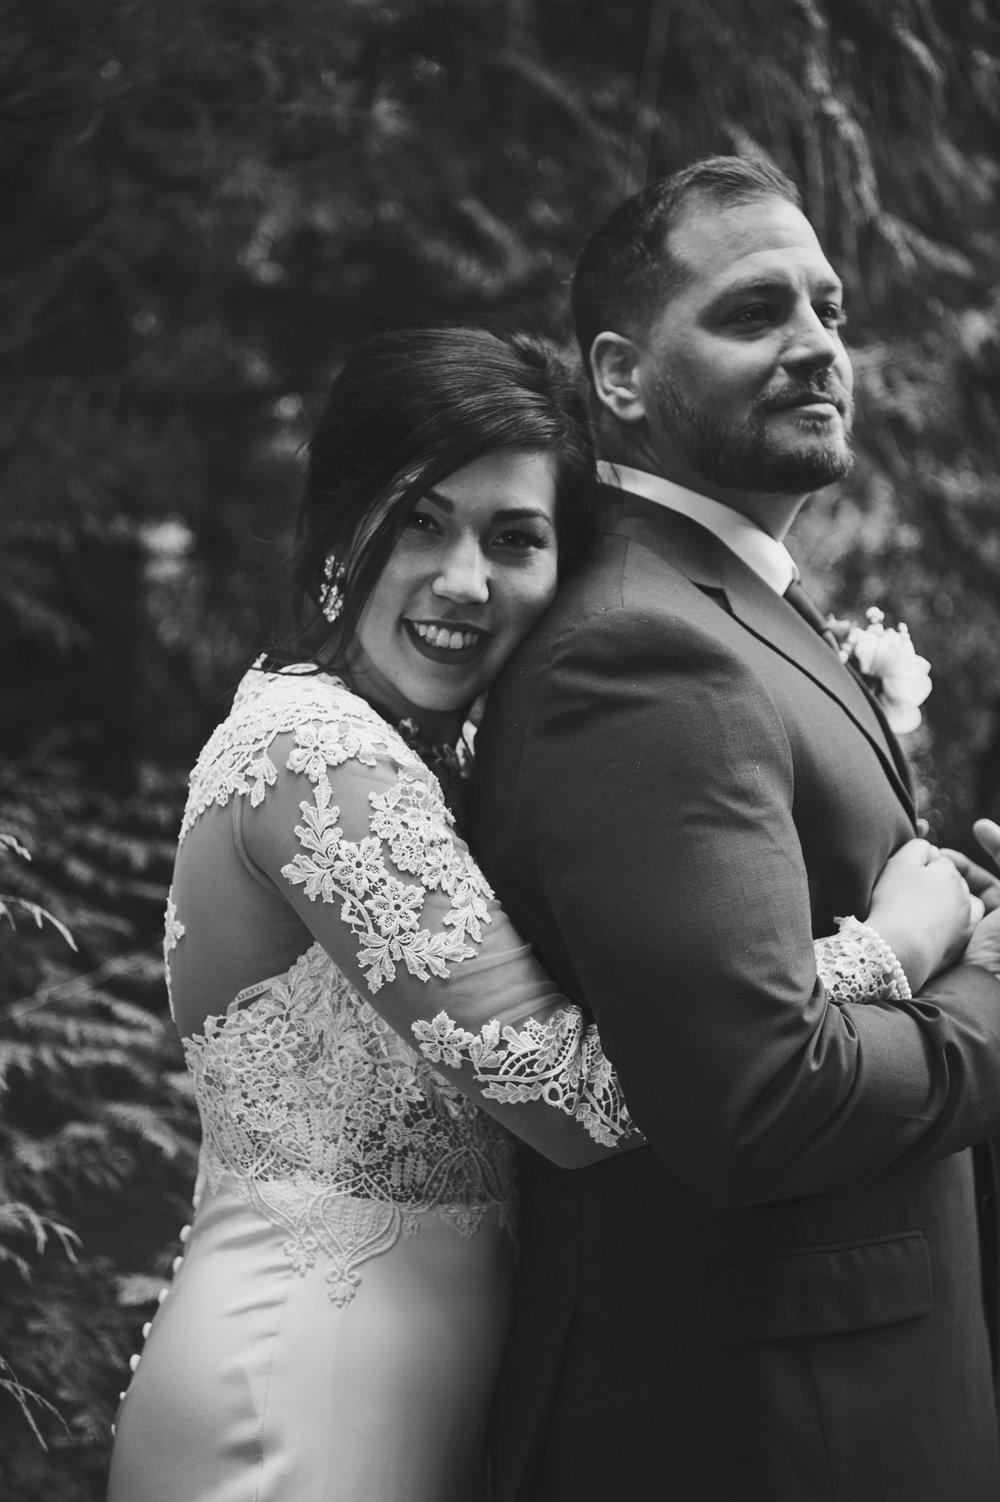 Woodsy Wedding_Kitsap Memorial State Park Wedding_Kelsey Lane Photography_intimate bride and groom